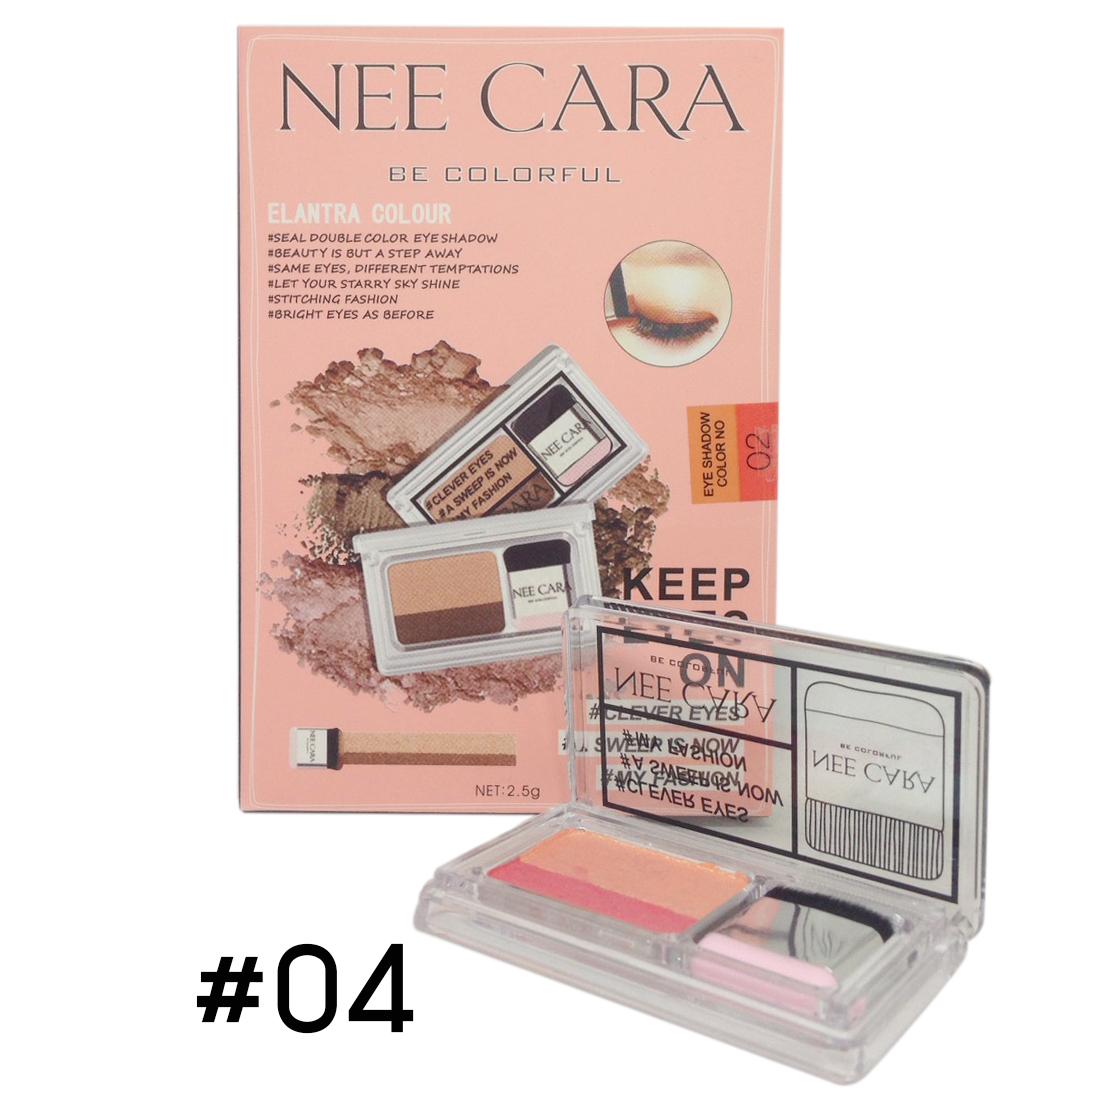 Nee cara Seal Double Color Eyeshadow อายแชโดว์ แมกกาซี ของนีคาร่า No.04